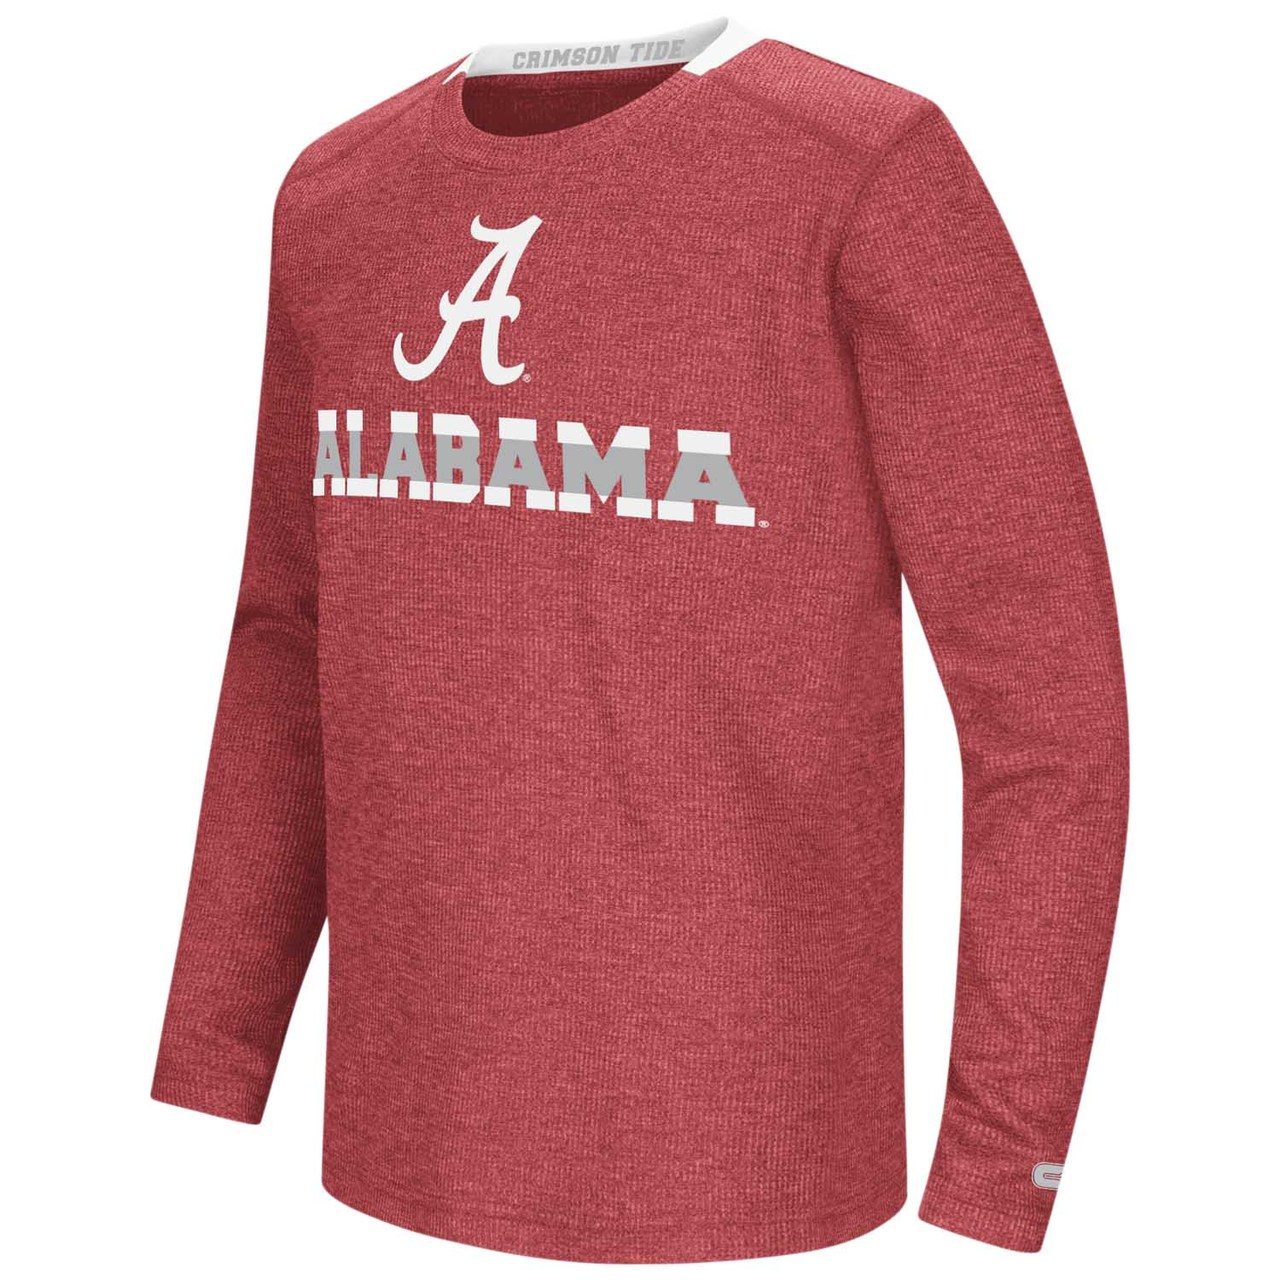 Alabama Crimson Tide Youth NCAA Steff Long Sleeve T-Shirt  - Team Color